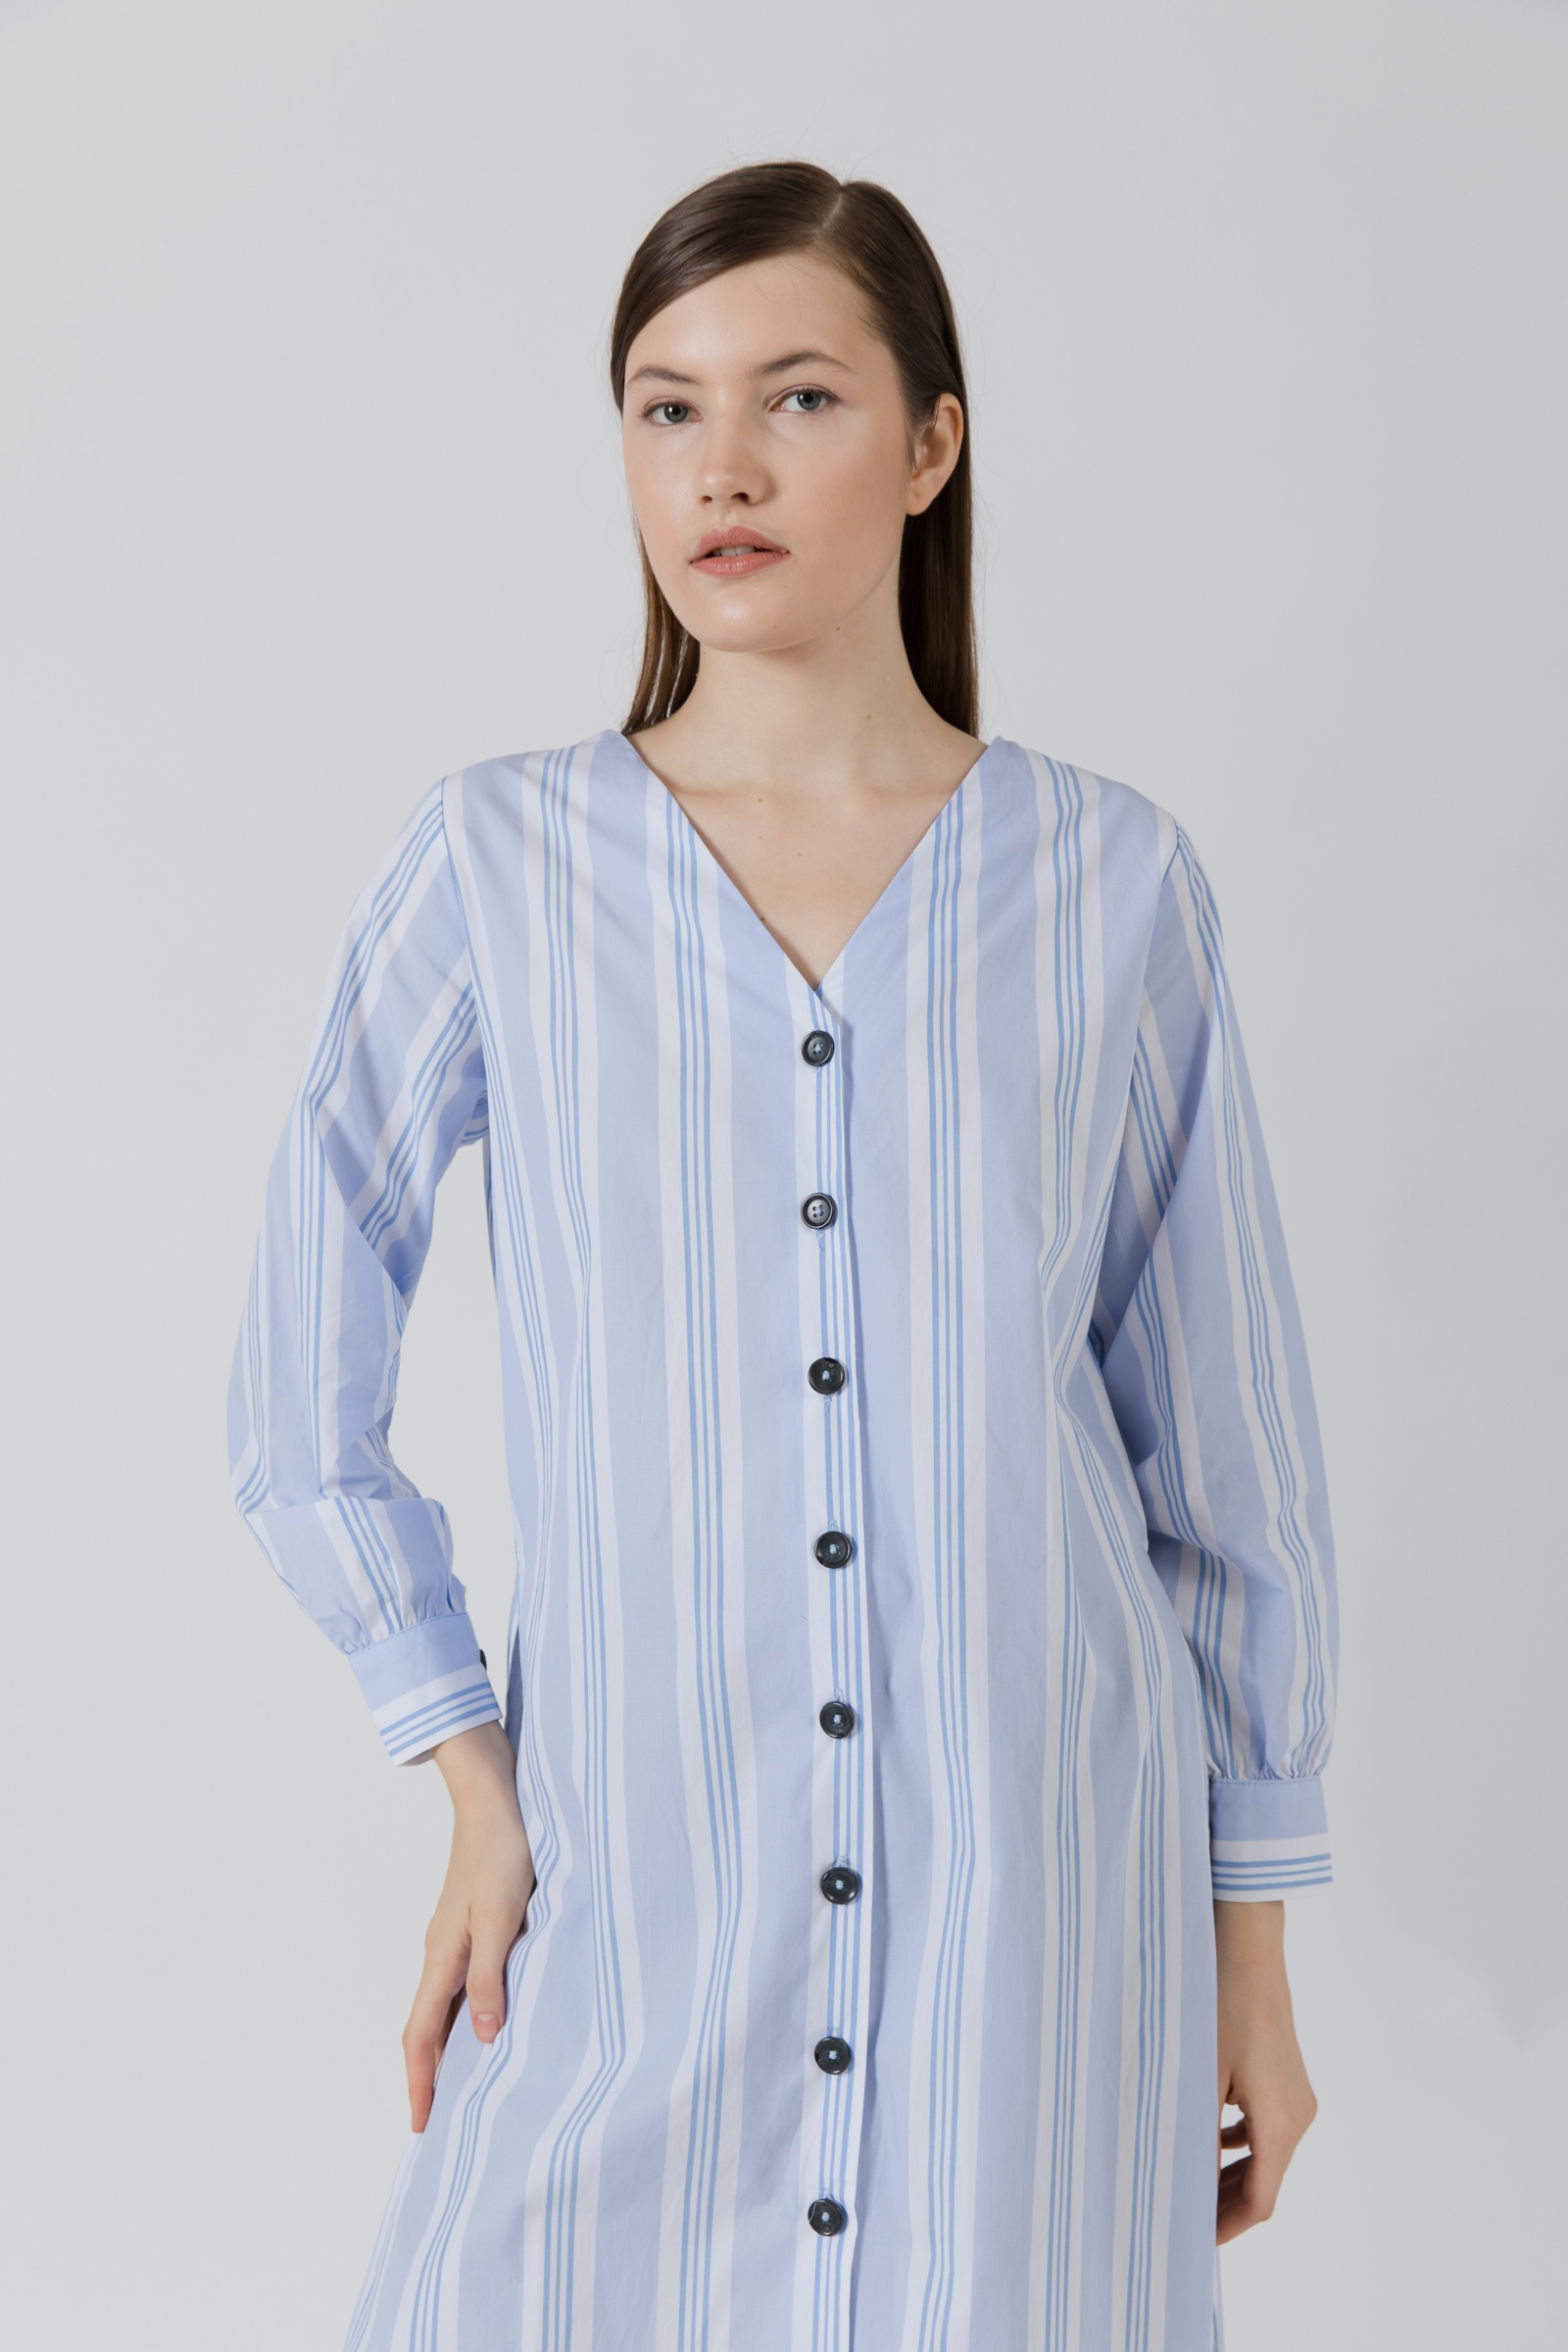 Picture of Bolton Slit Shirt BlueStripe